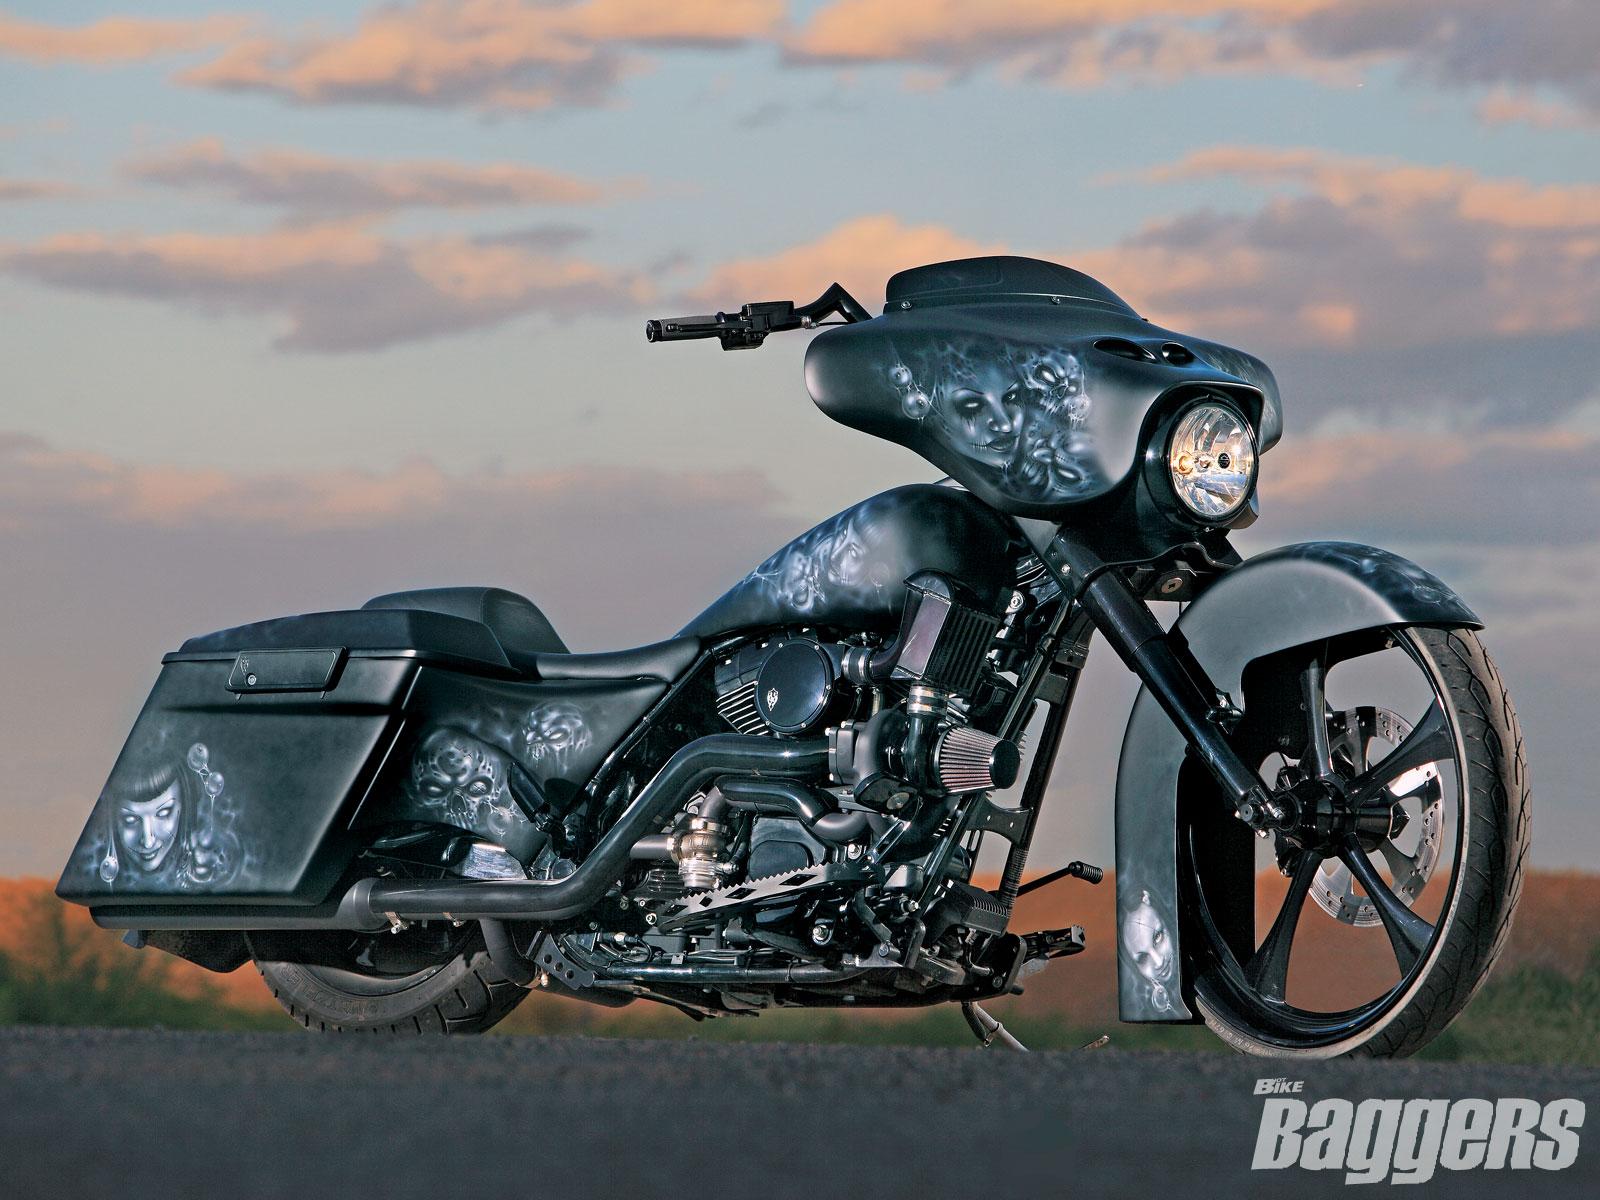 motorcycle harley street glide wallpaper - photo #24